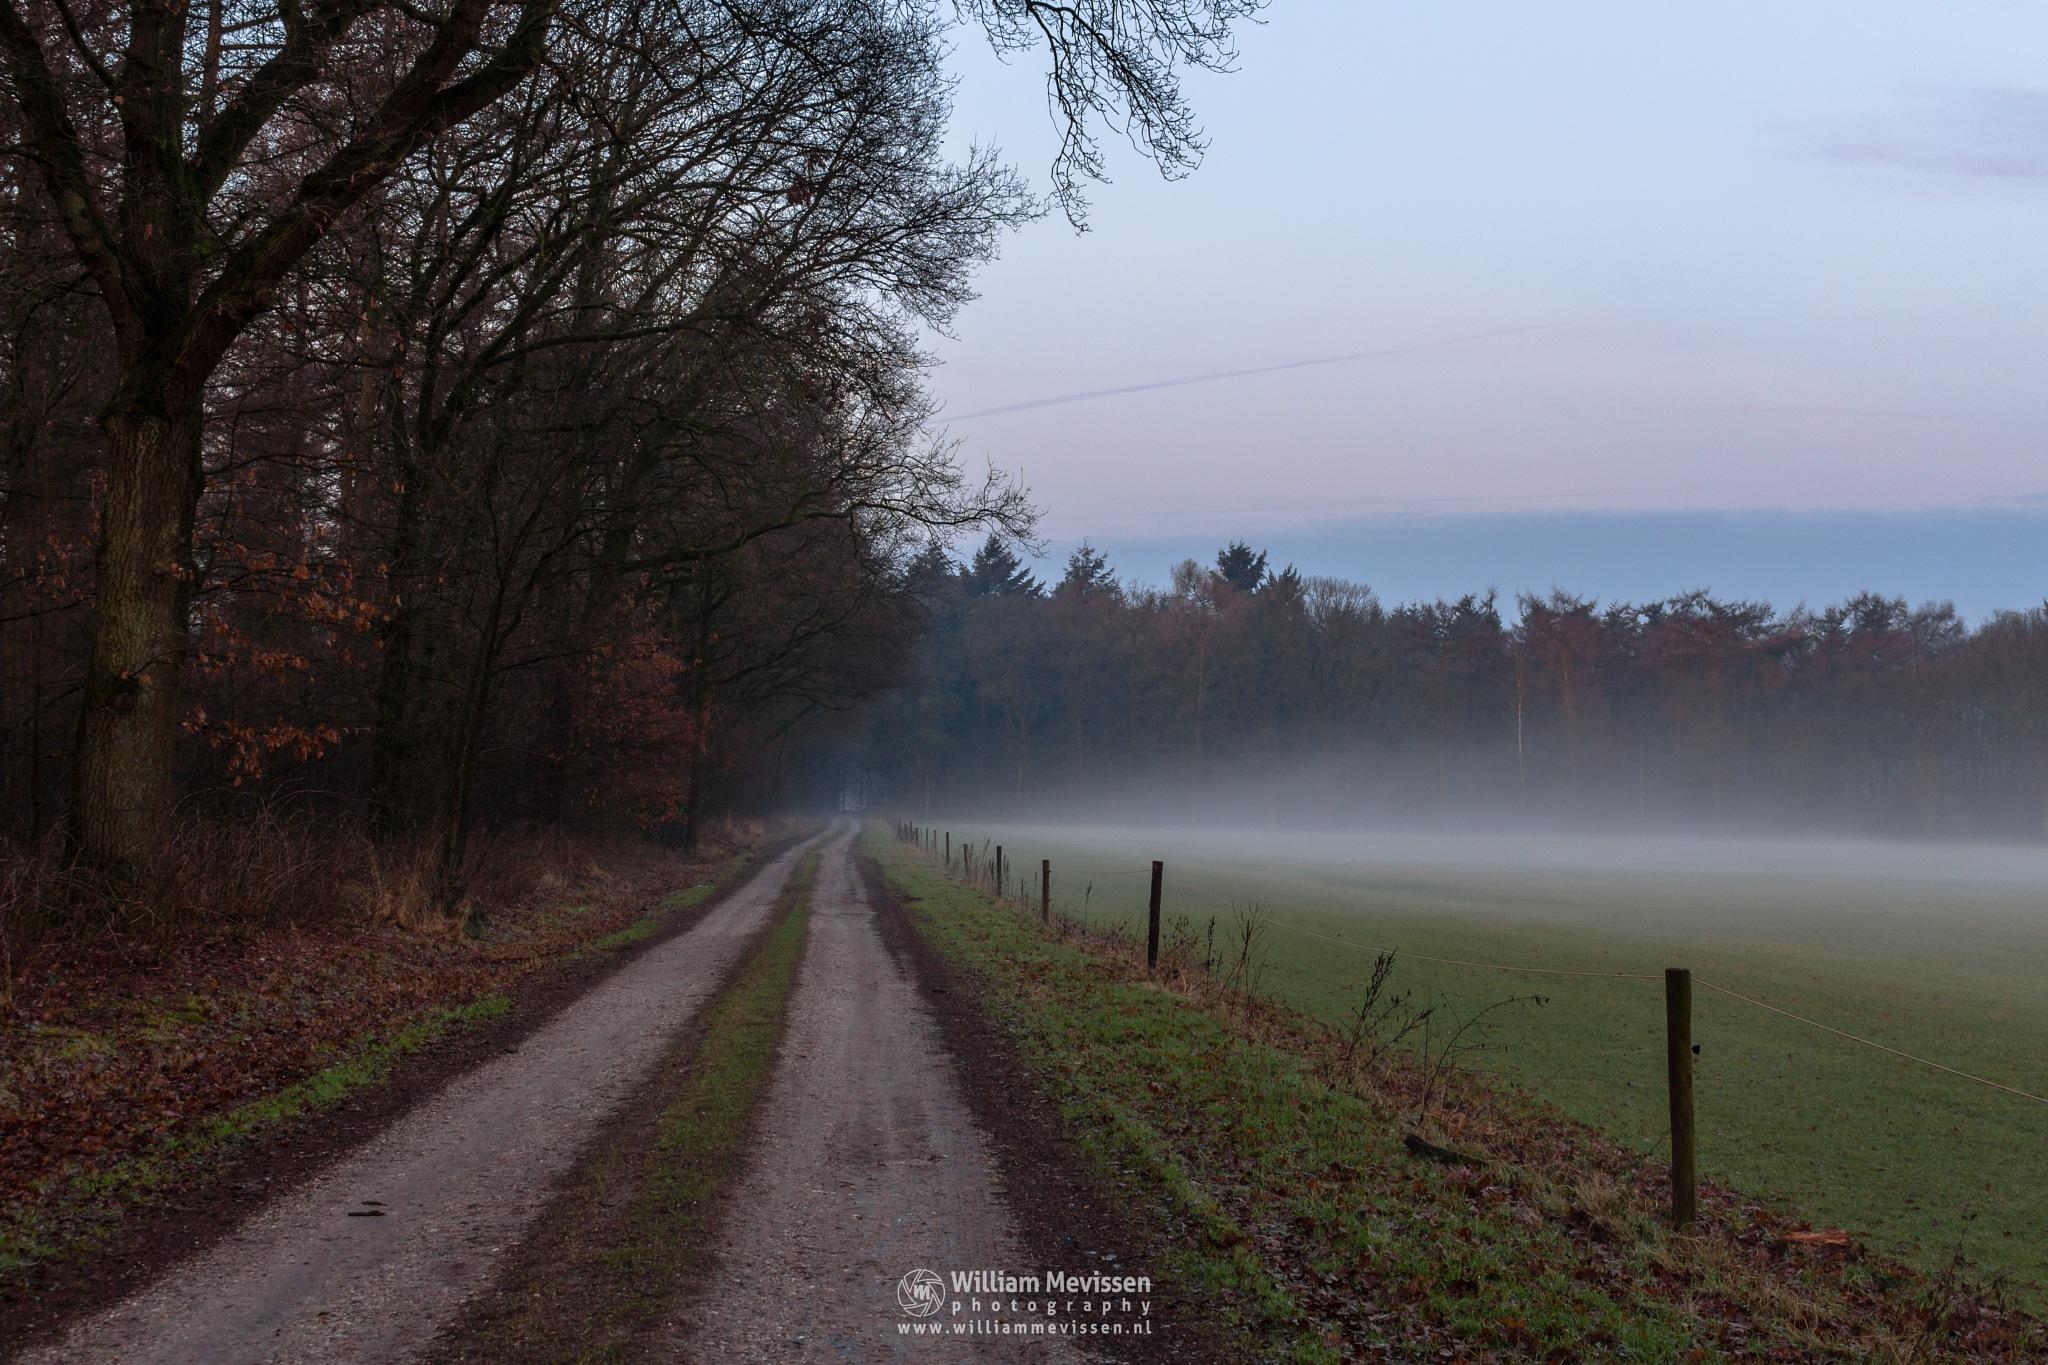 Rural Dirt Road by William Mevissen